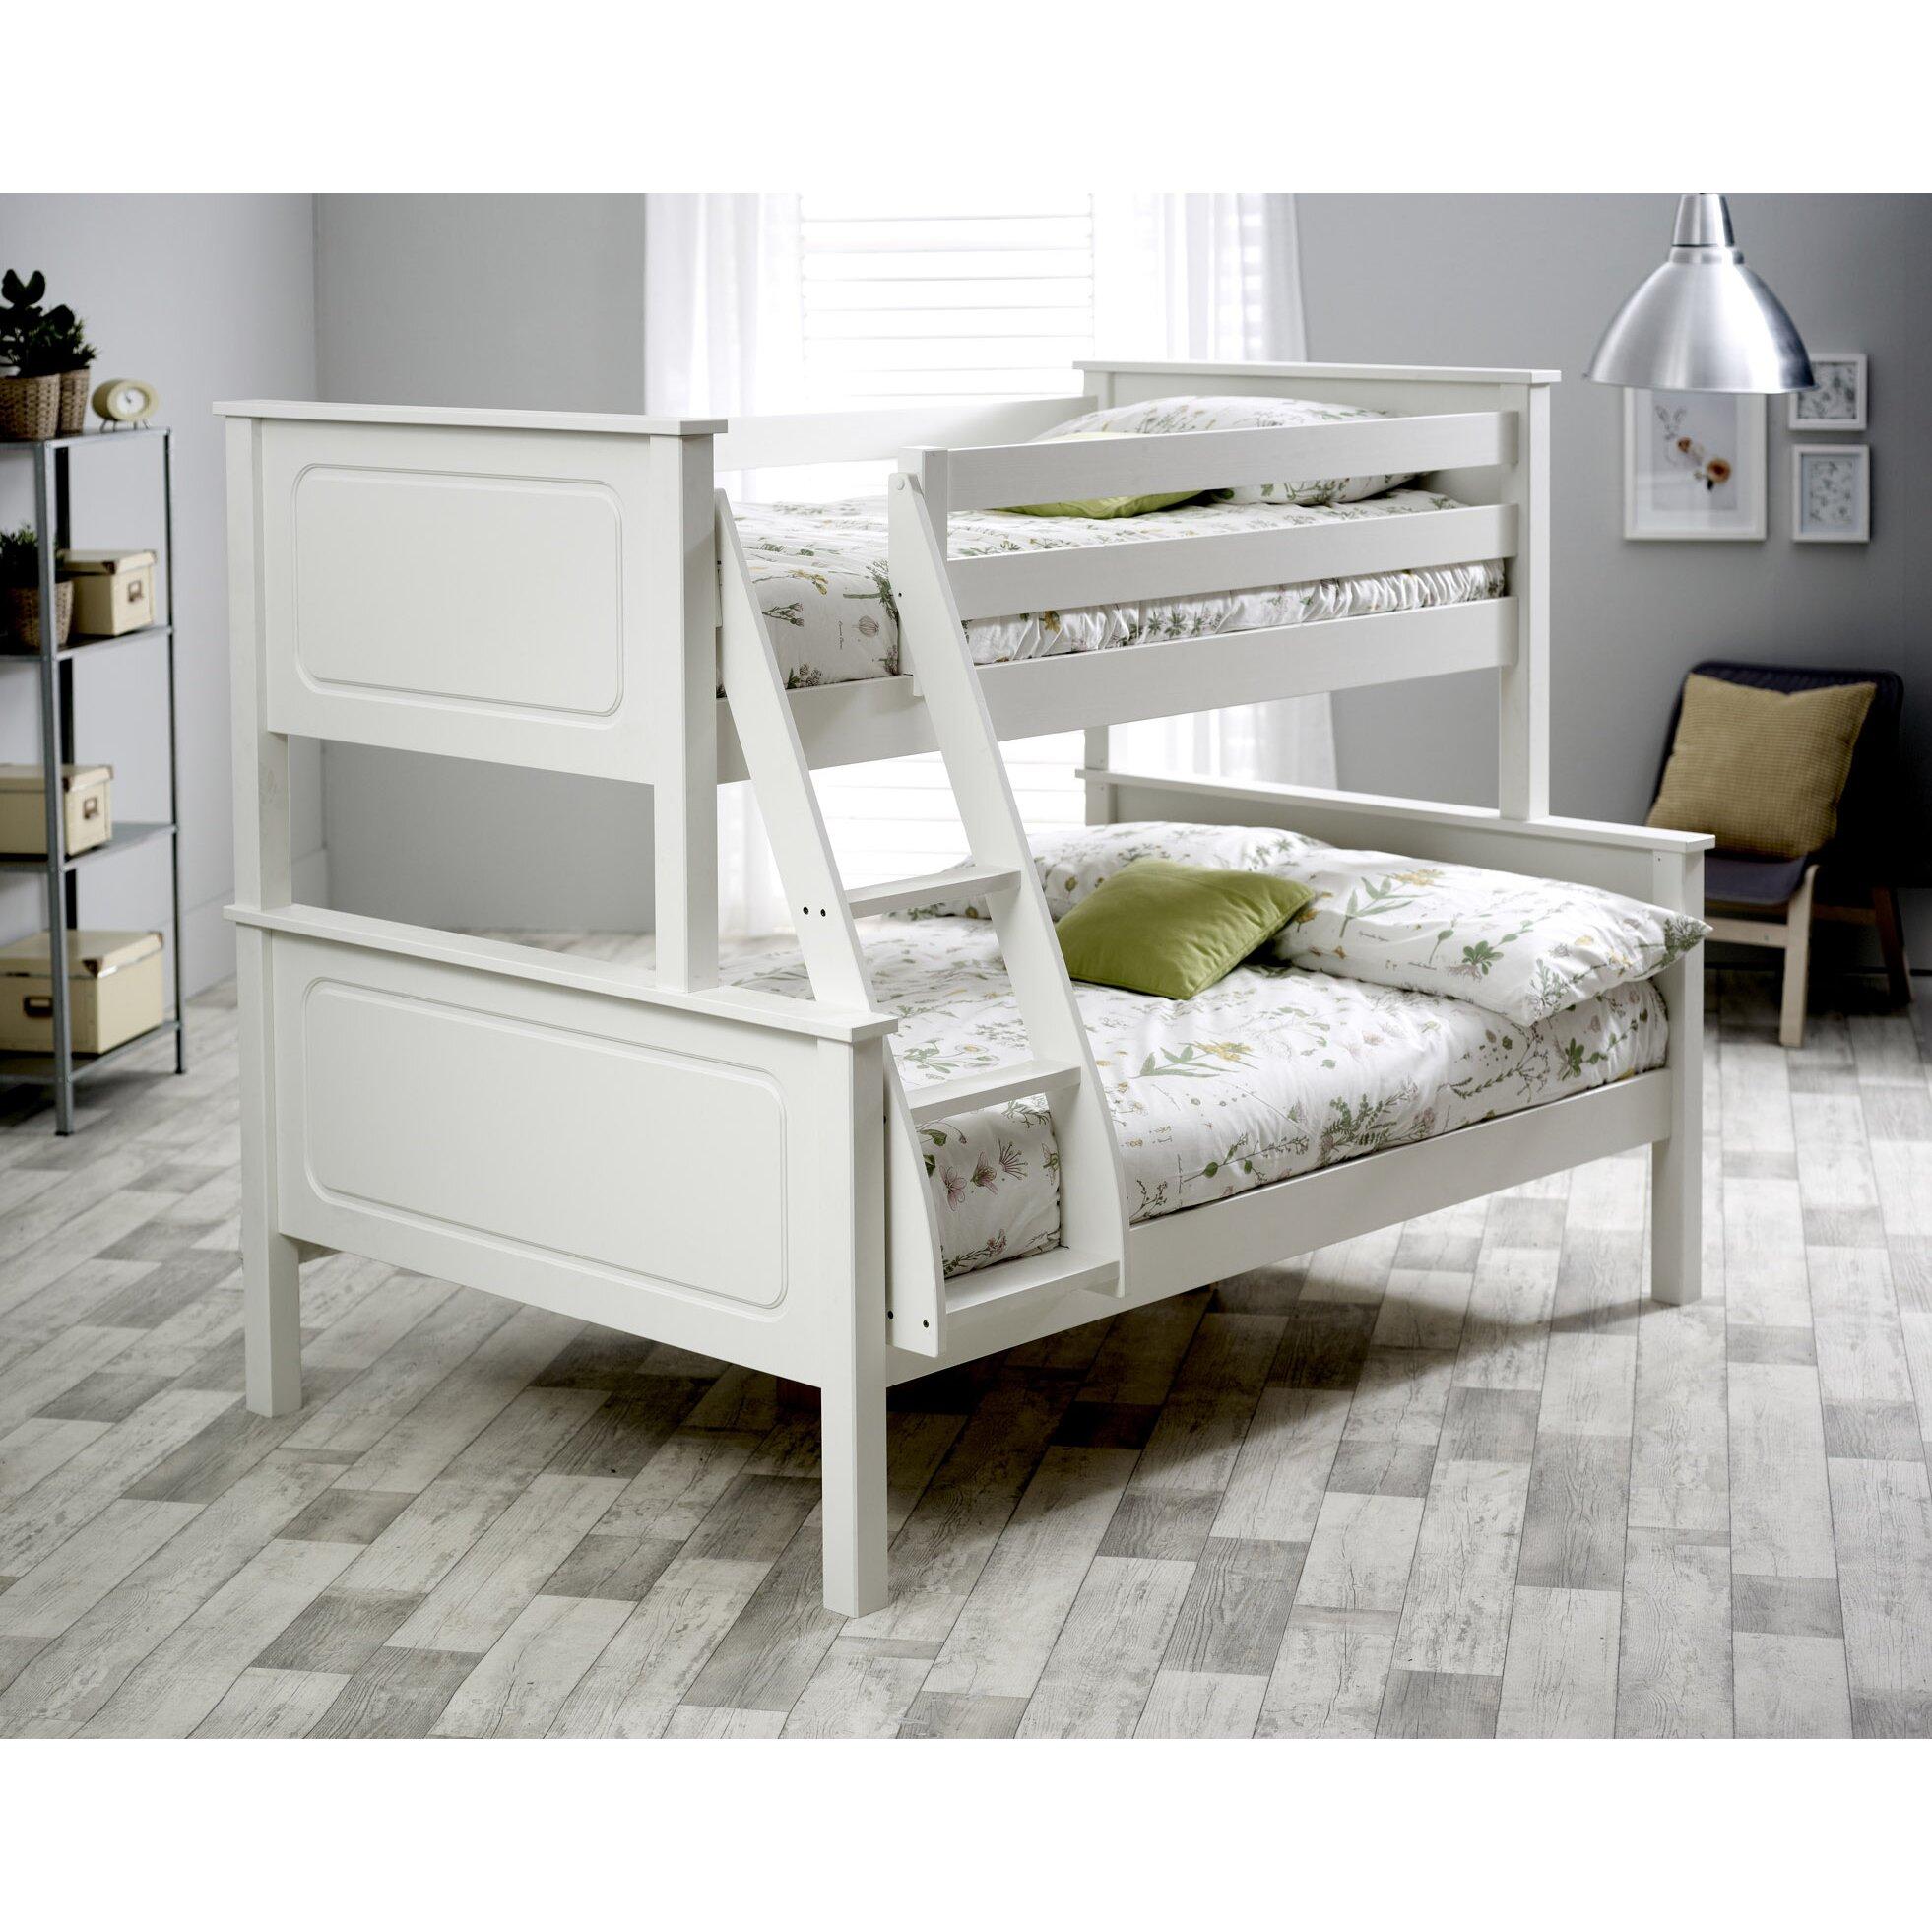 homestead living ashley triple sleeper bunk bed with mattresses wayfair uk. Black Bedroom Furniture Sets. Home Design Ideas